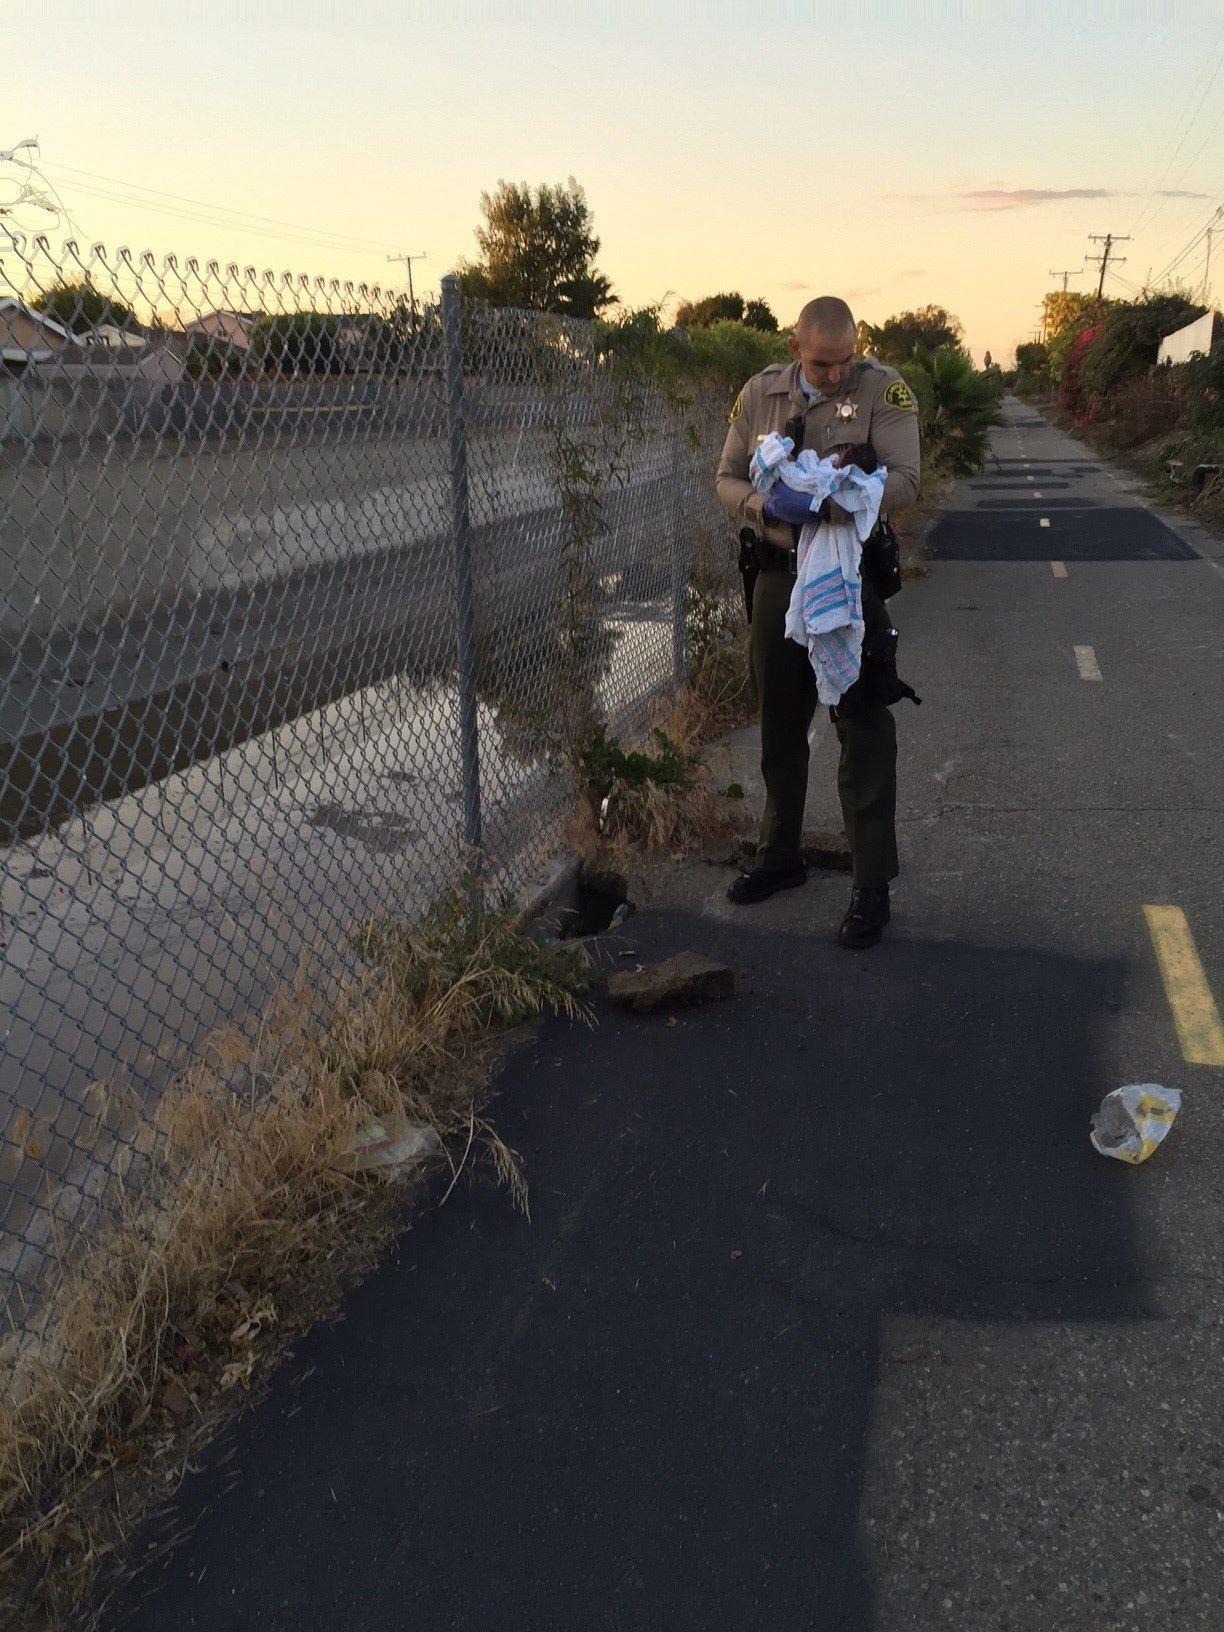 A newborn baby was found in Compton